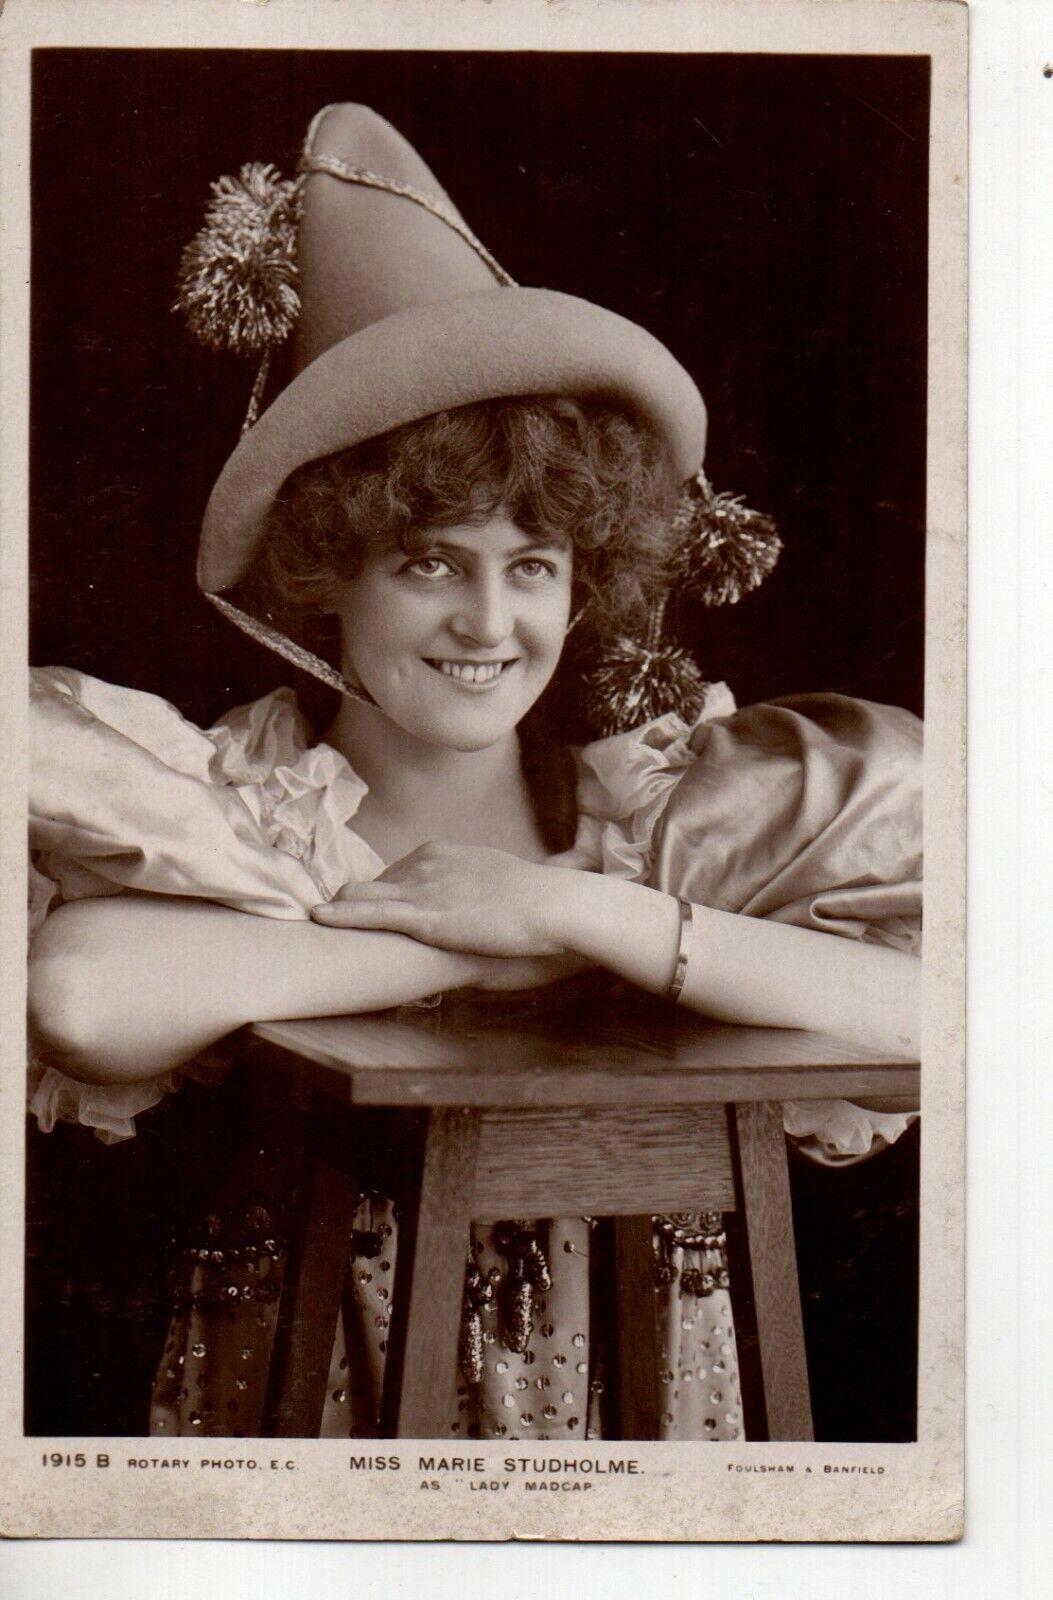 70268 Orig 1906 RPPC PC British Theatre Actress Marie Studholme As Lady Madcap - $8.50